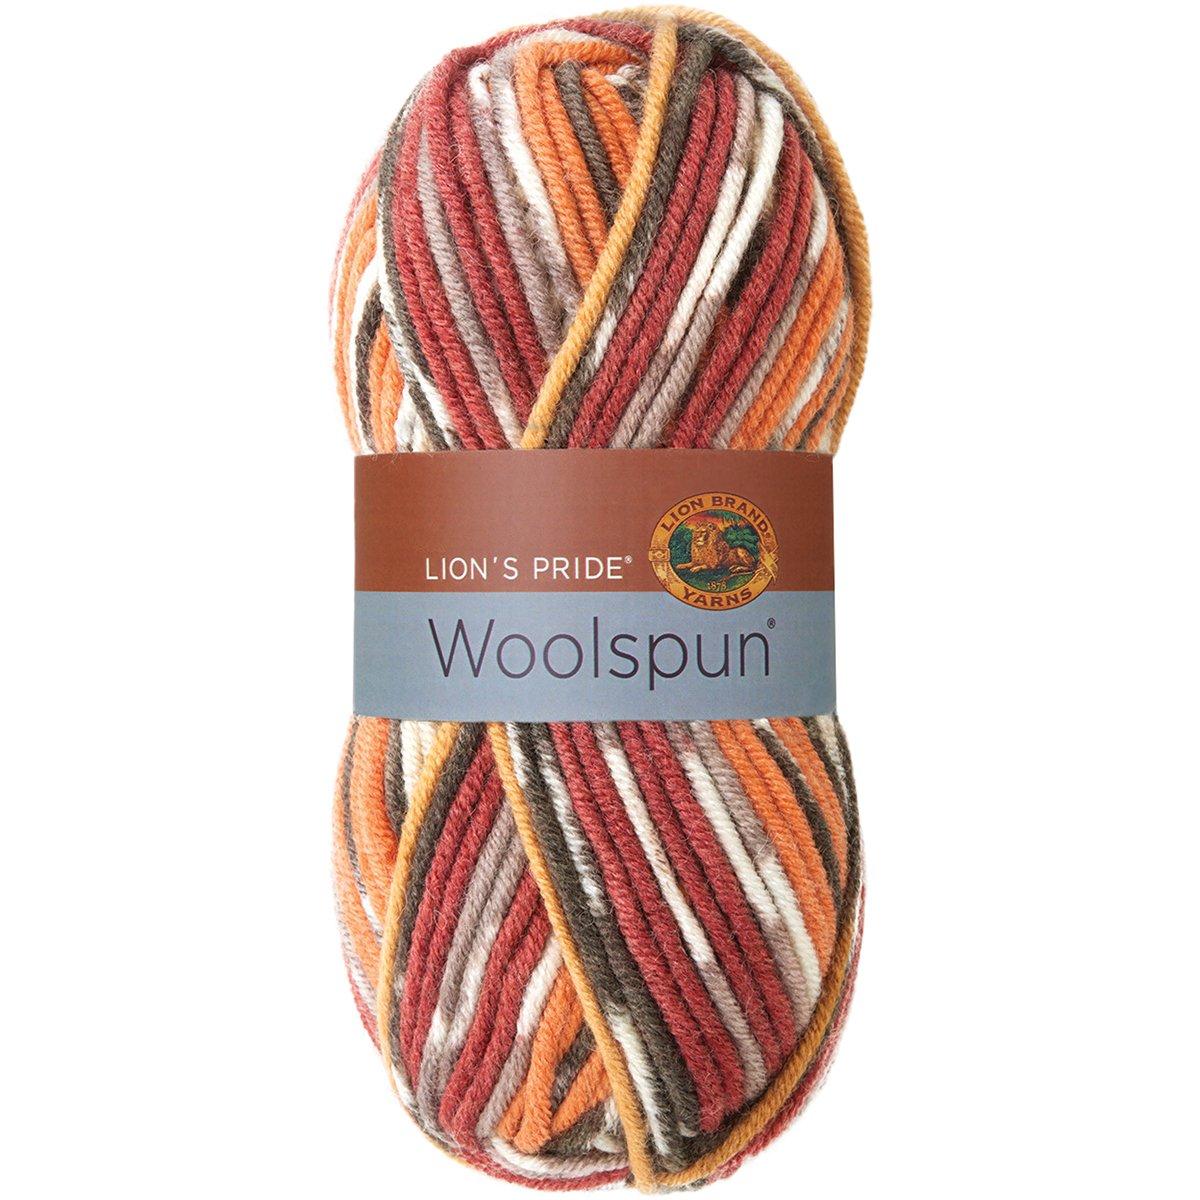 Lion Brand Yarn 671-201 Lions Pride Woolspun Yarn Mesa Print